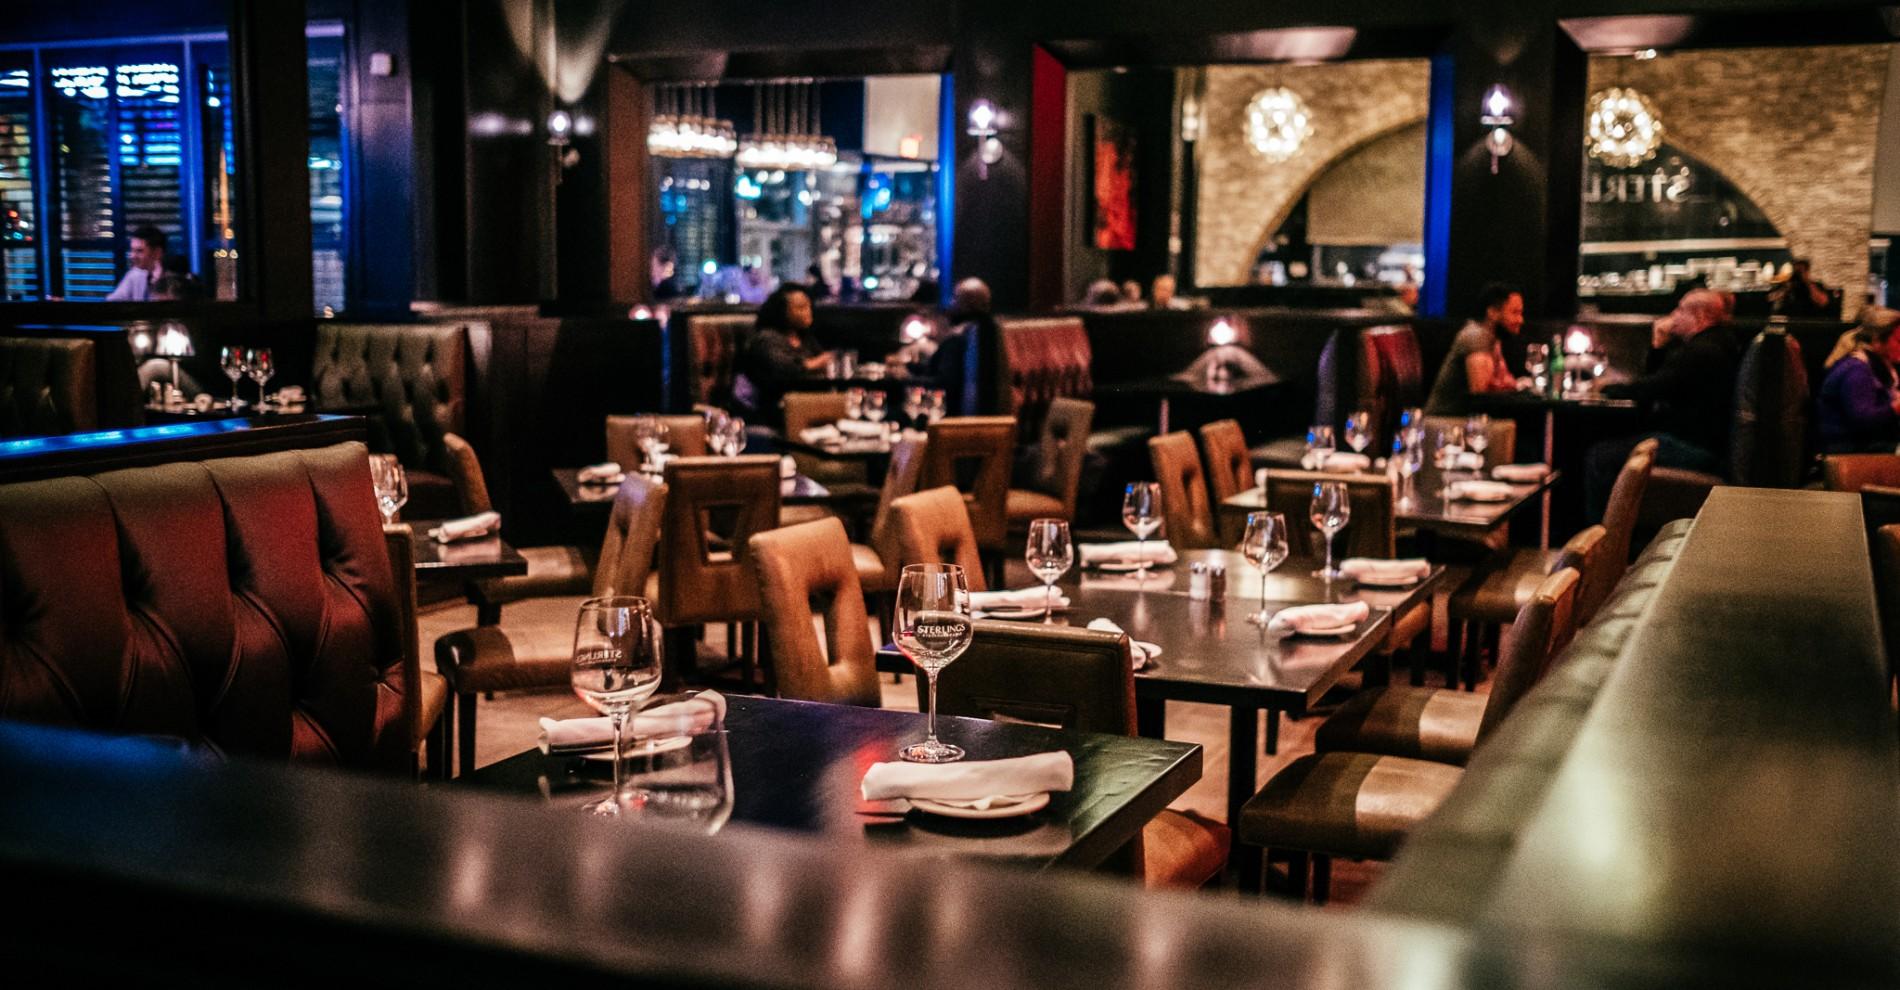 Details Sterlings Steakhouse 2018 127 Fr